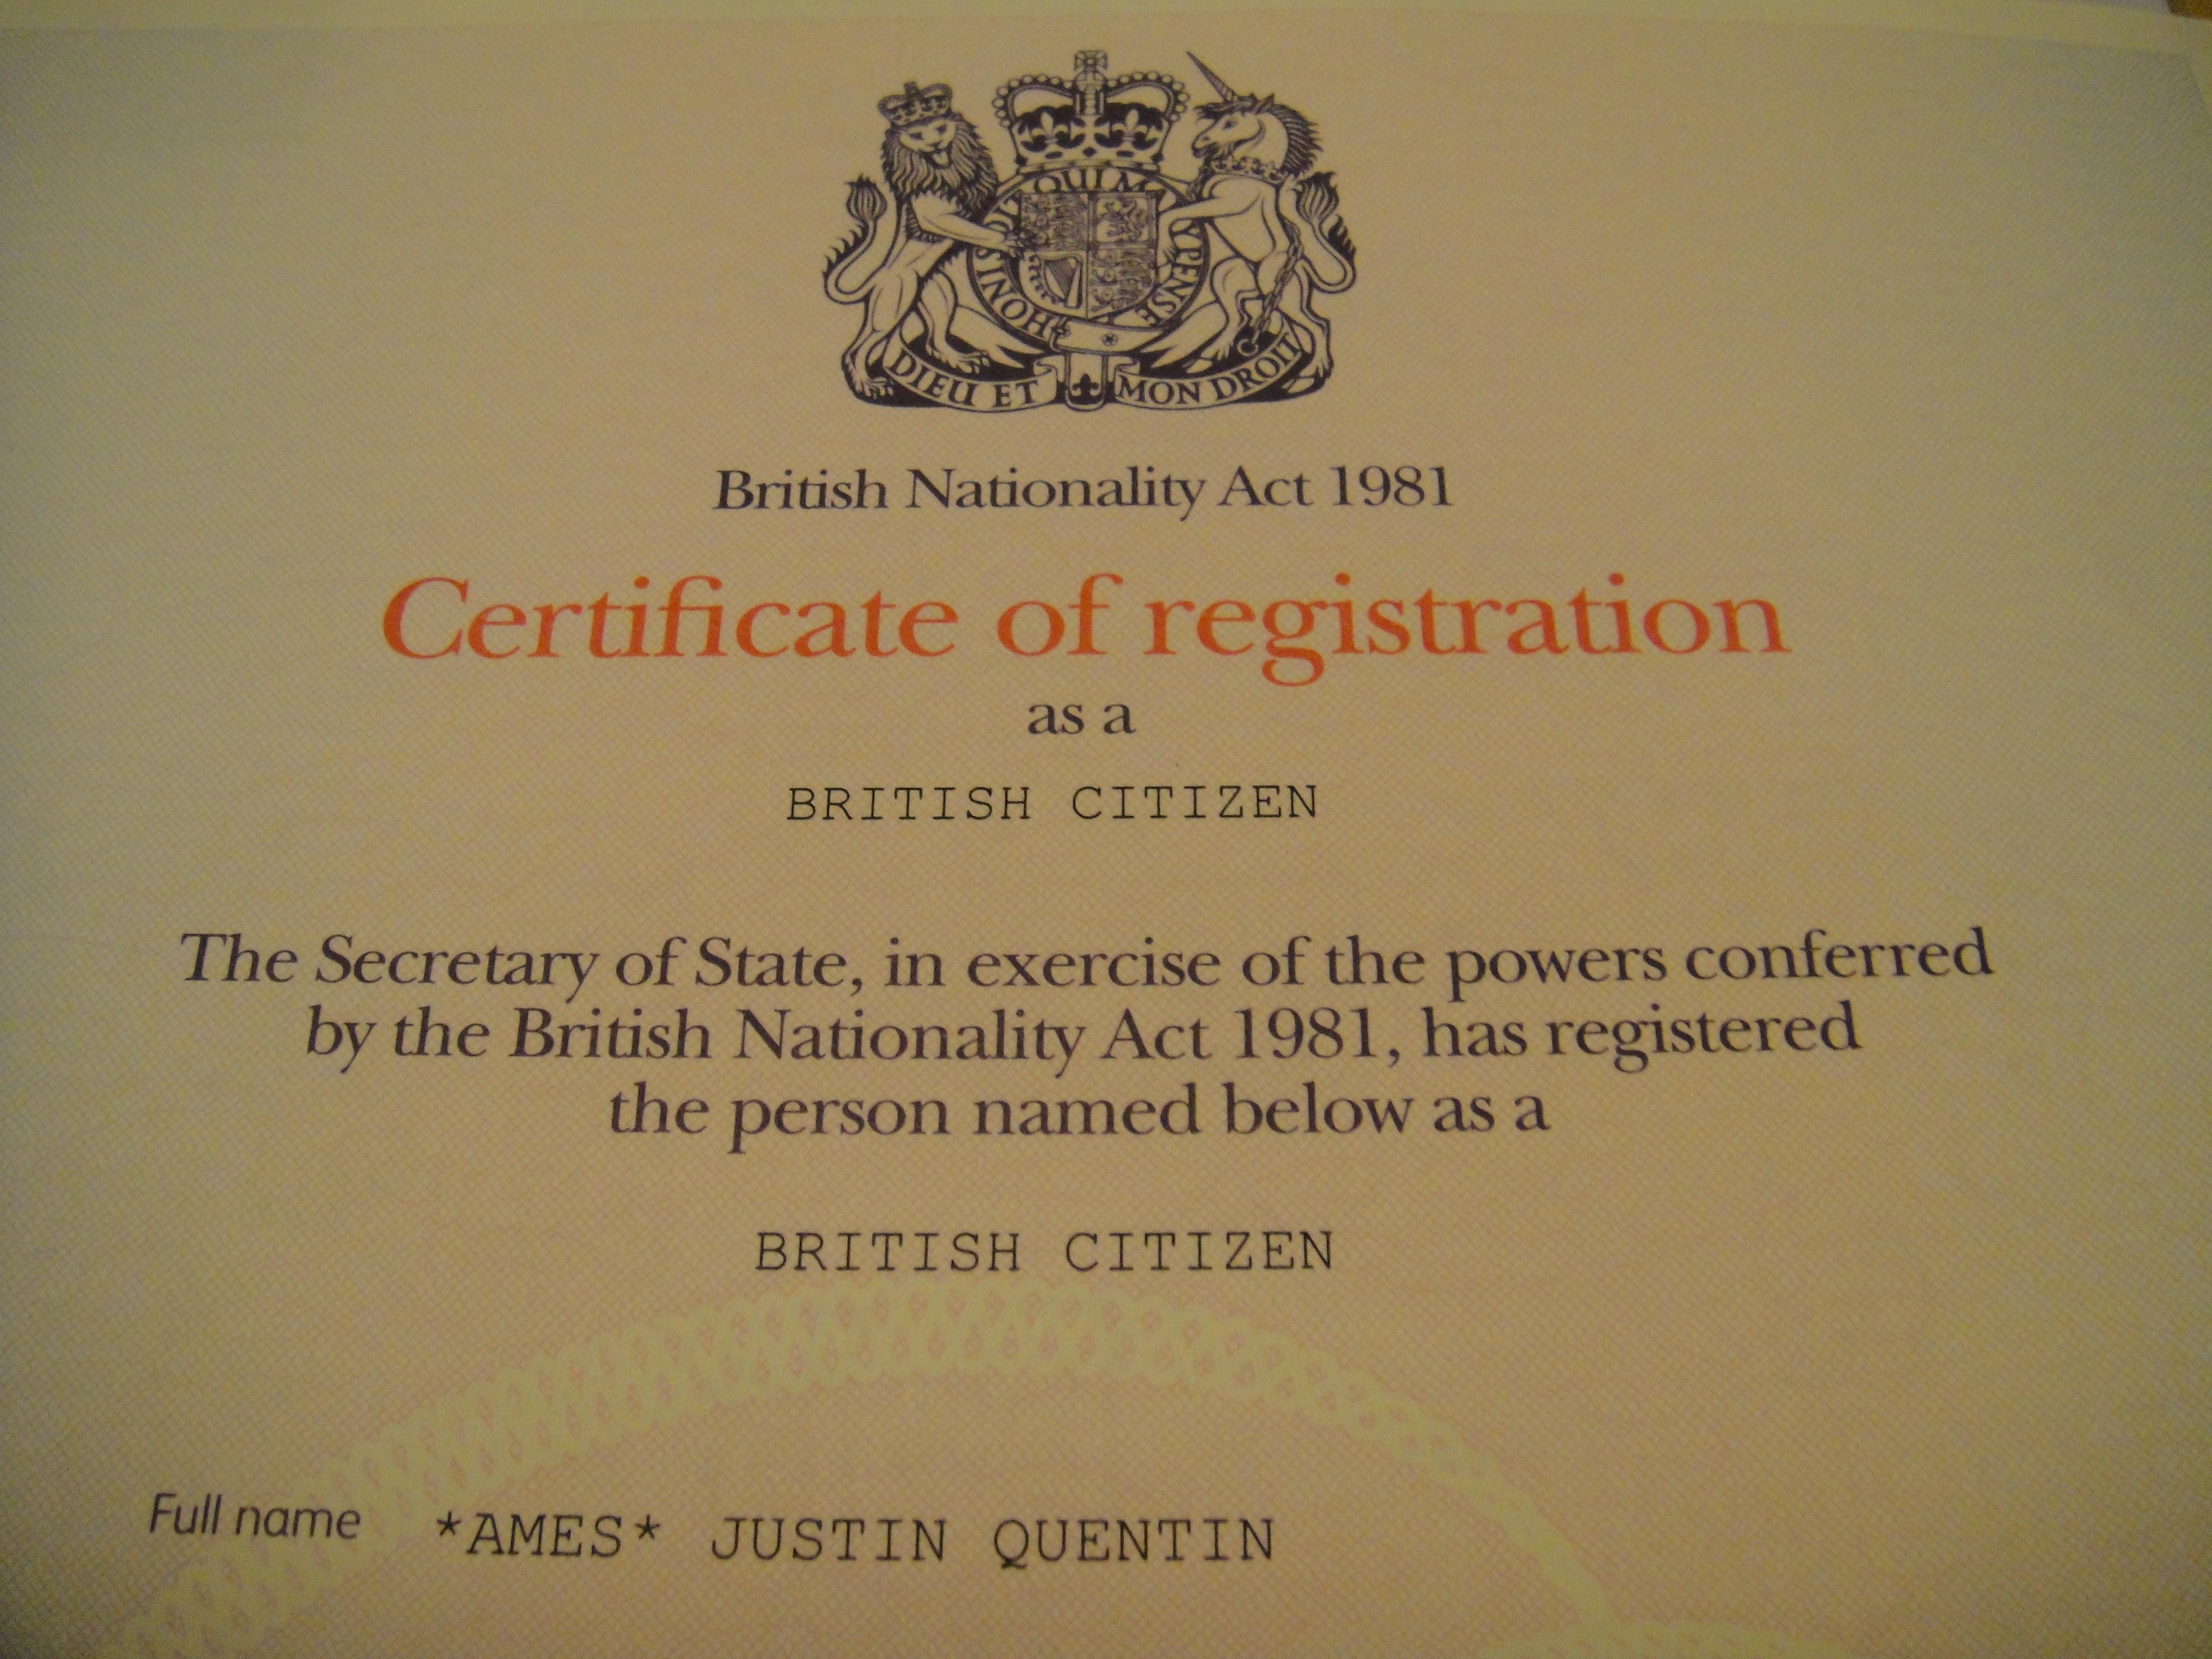 Justin-Ames-British-Citizen